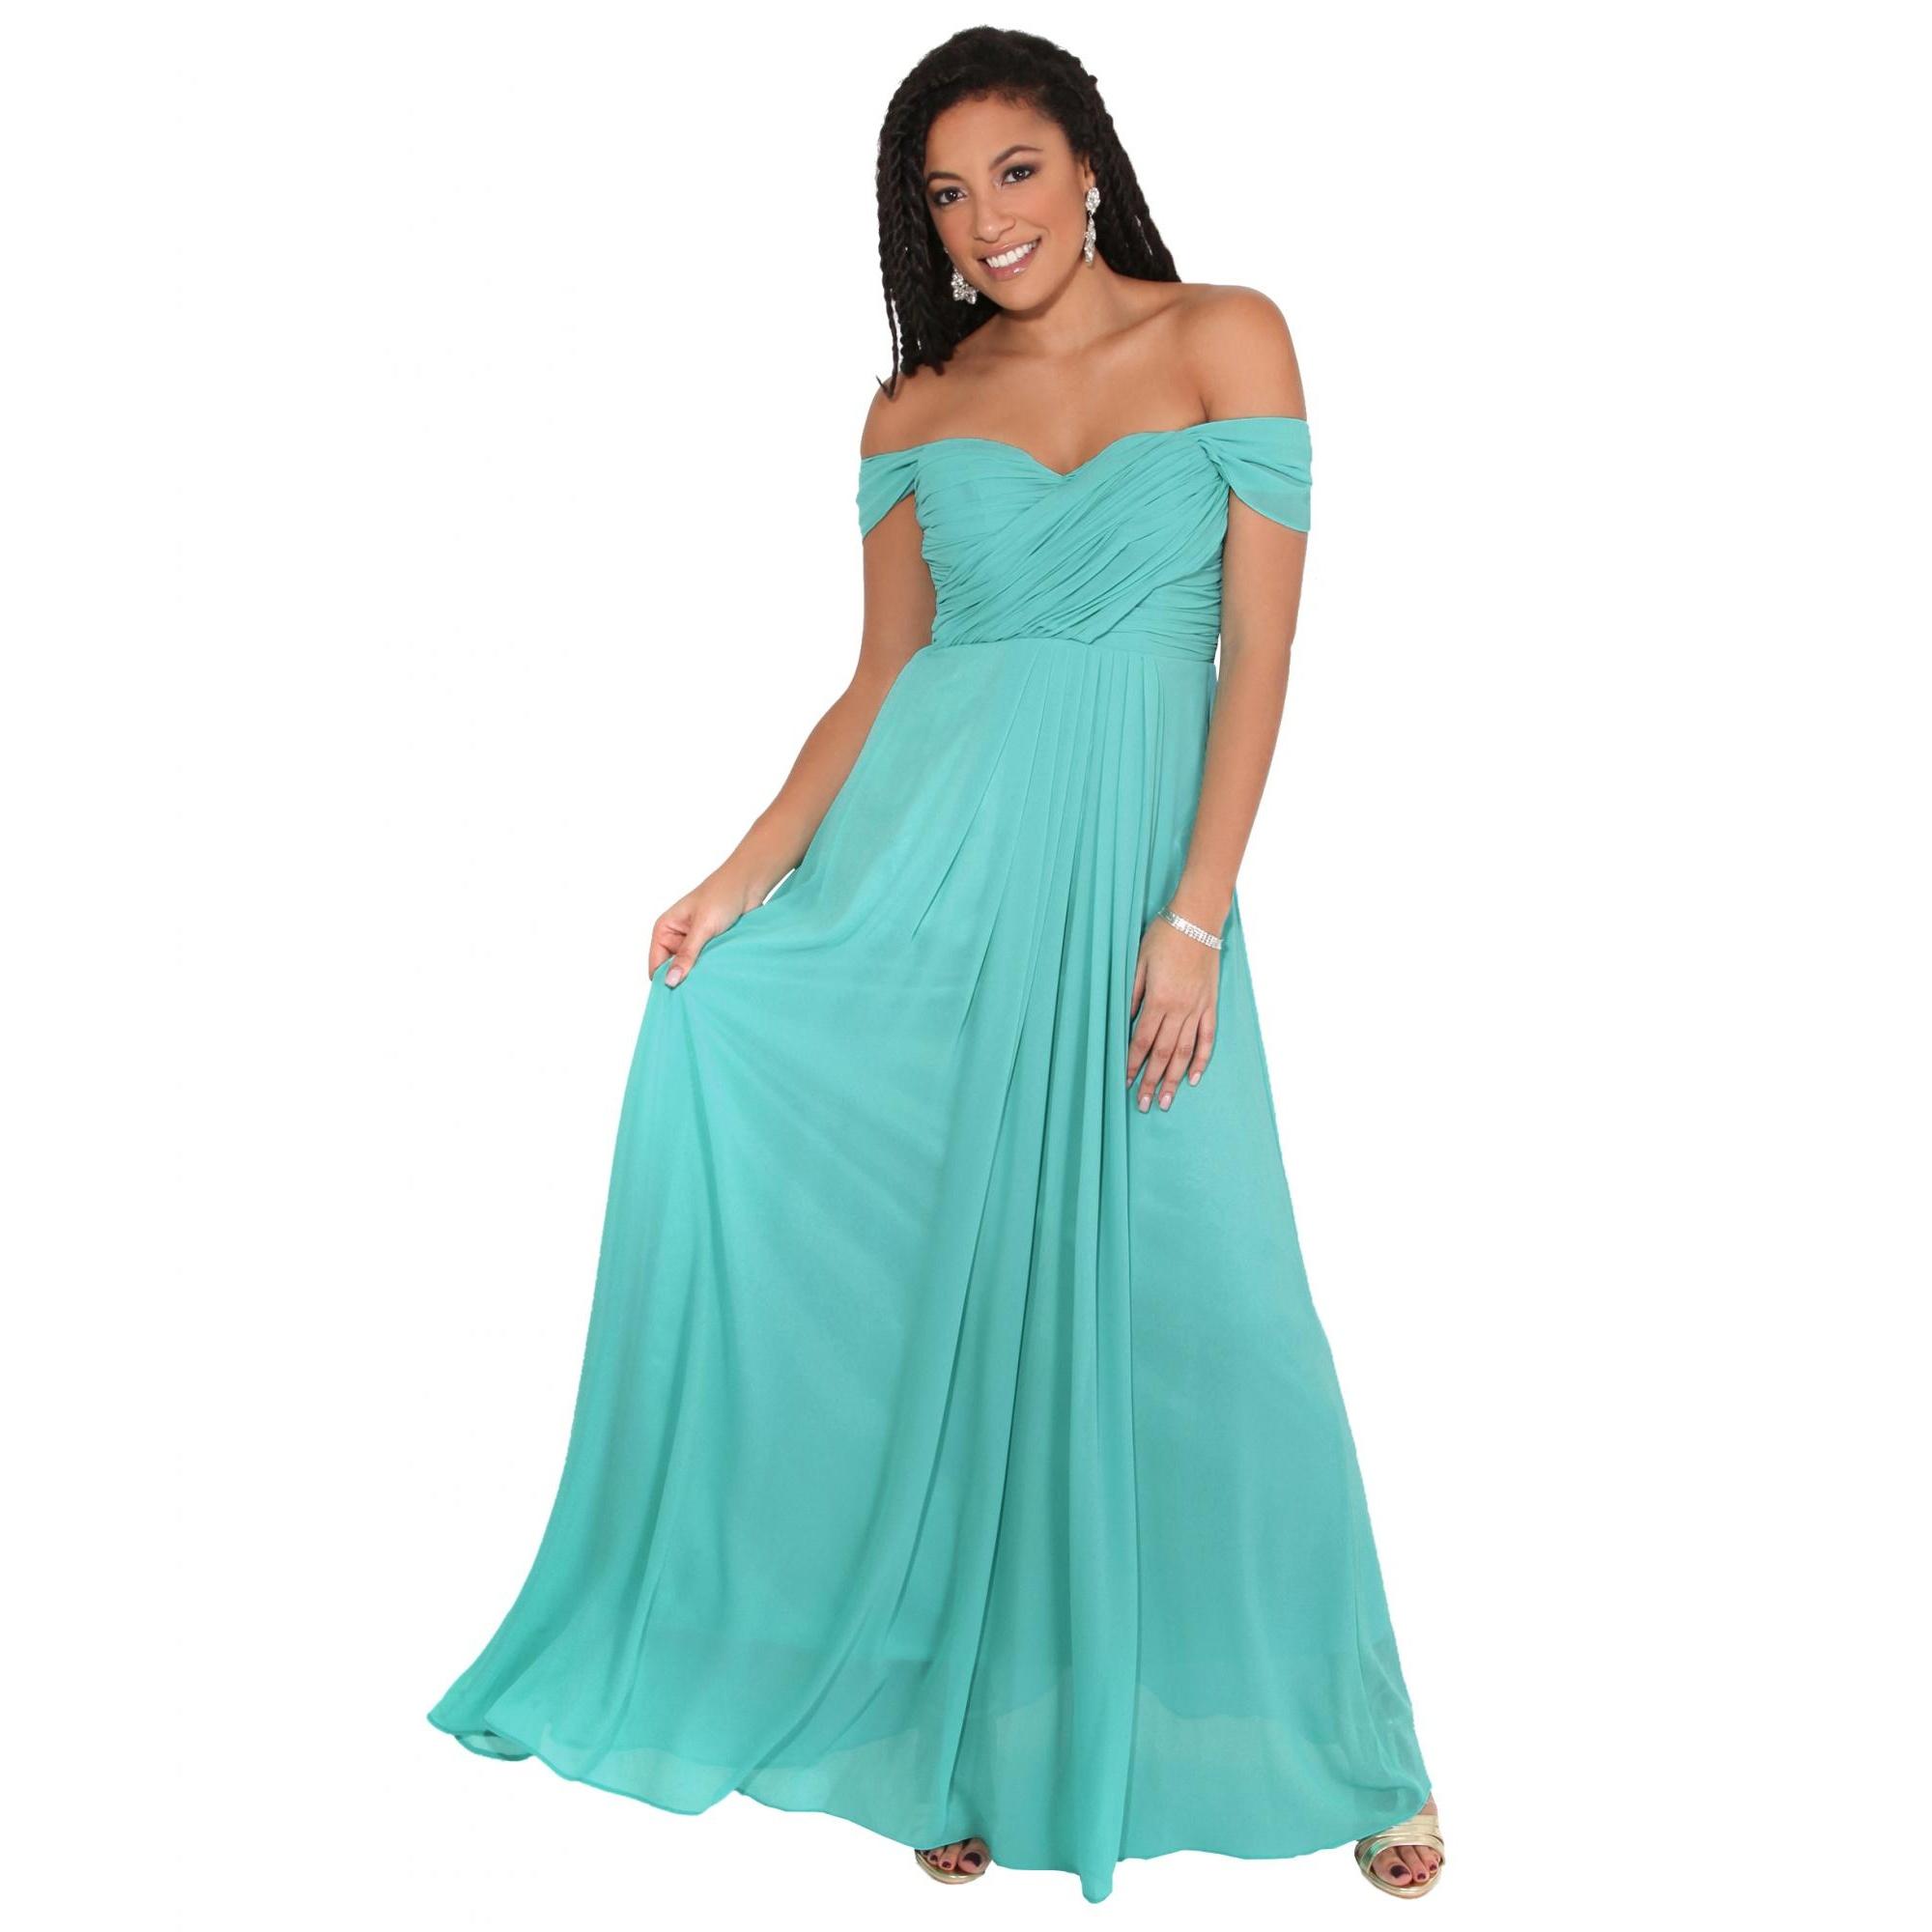 Krisp Womens/Ladies Multiway Neckline Occasion Maxi Dress (18 UK) (Turquoise)